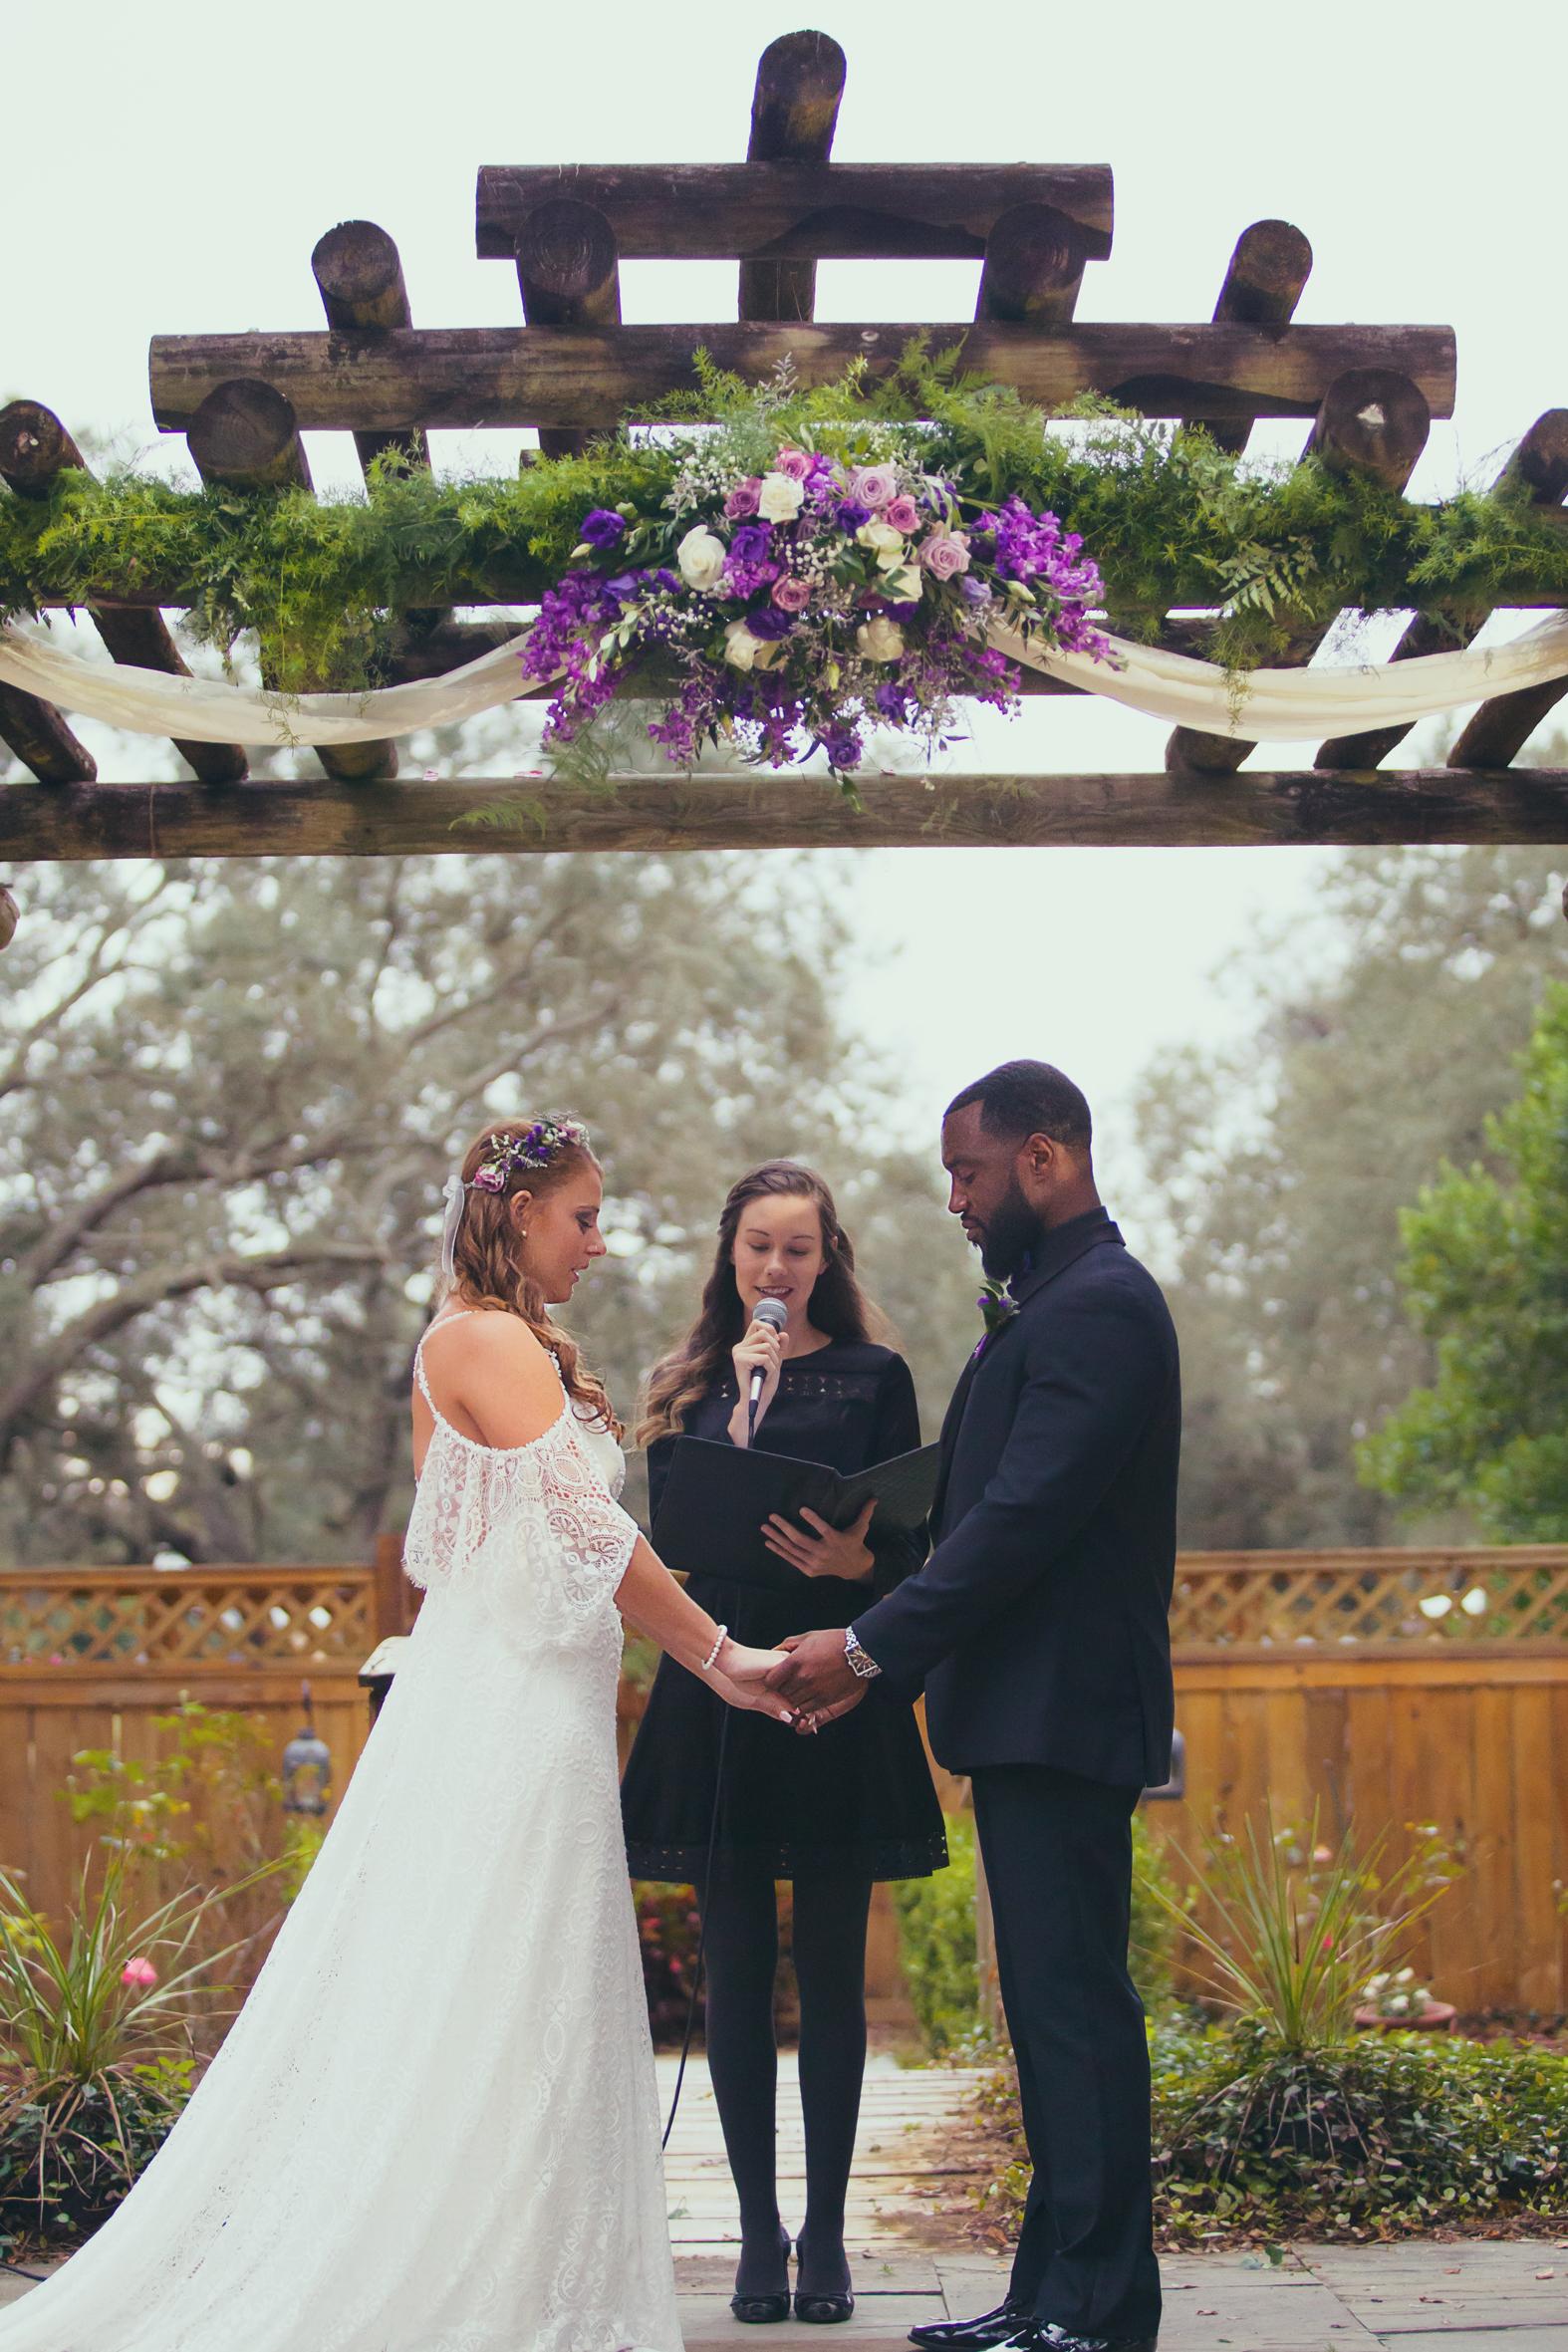 harmony-gardens-wedding-chamber-photography-moments-antoine-hart-9.jpg